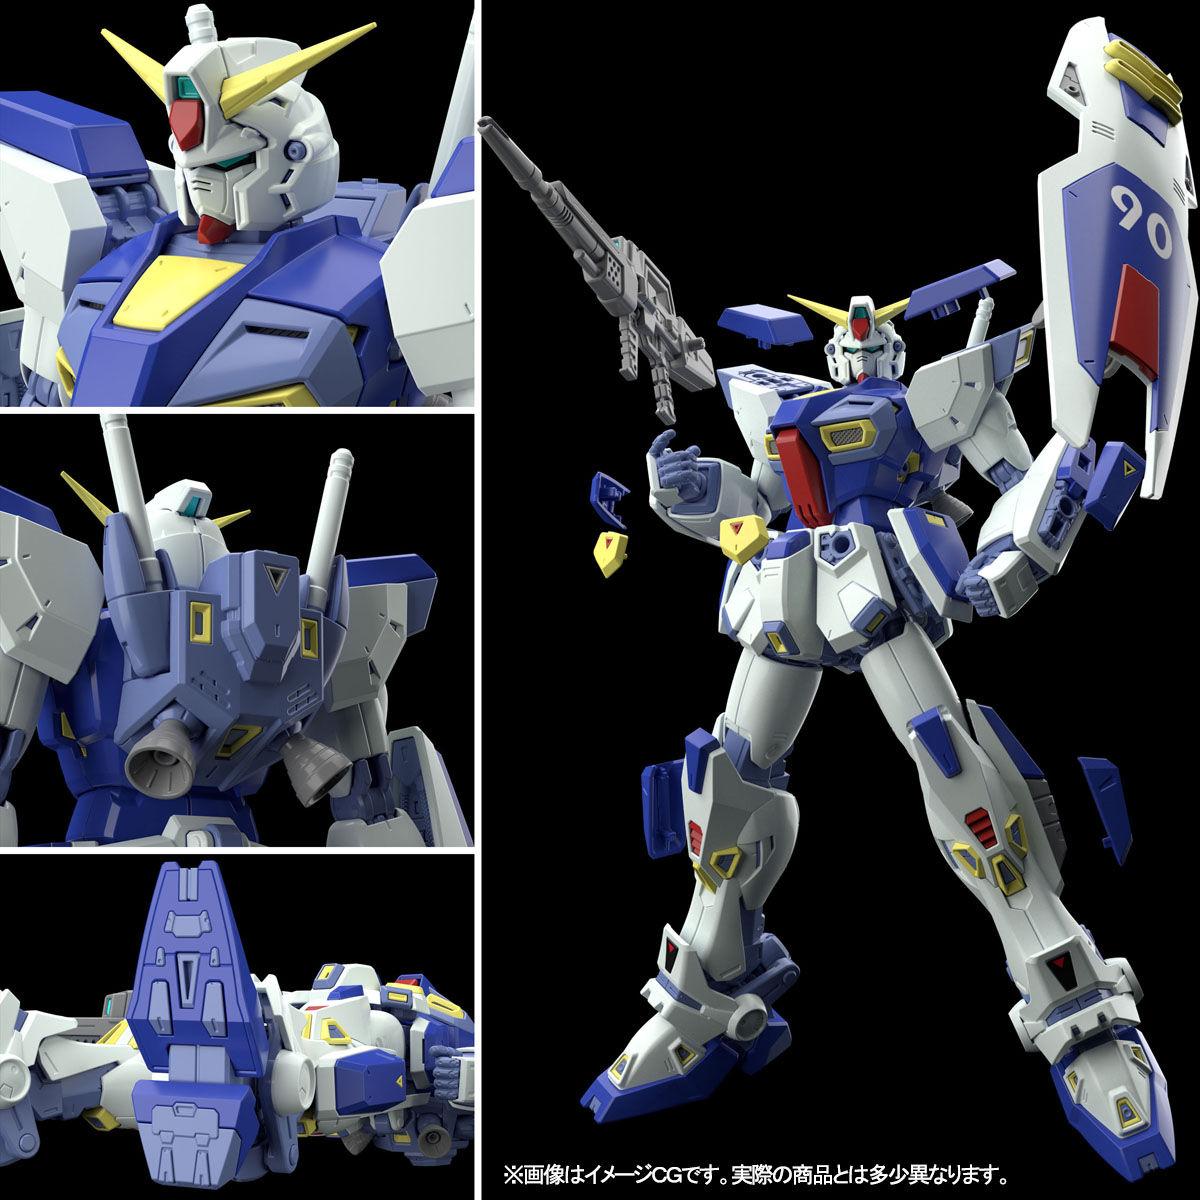 P Bandai F90 A To Z Project MG 100 GUNDAM F90 FULL Promo